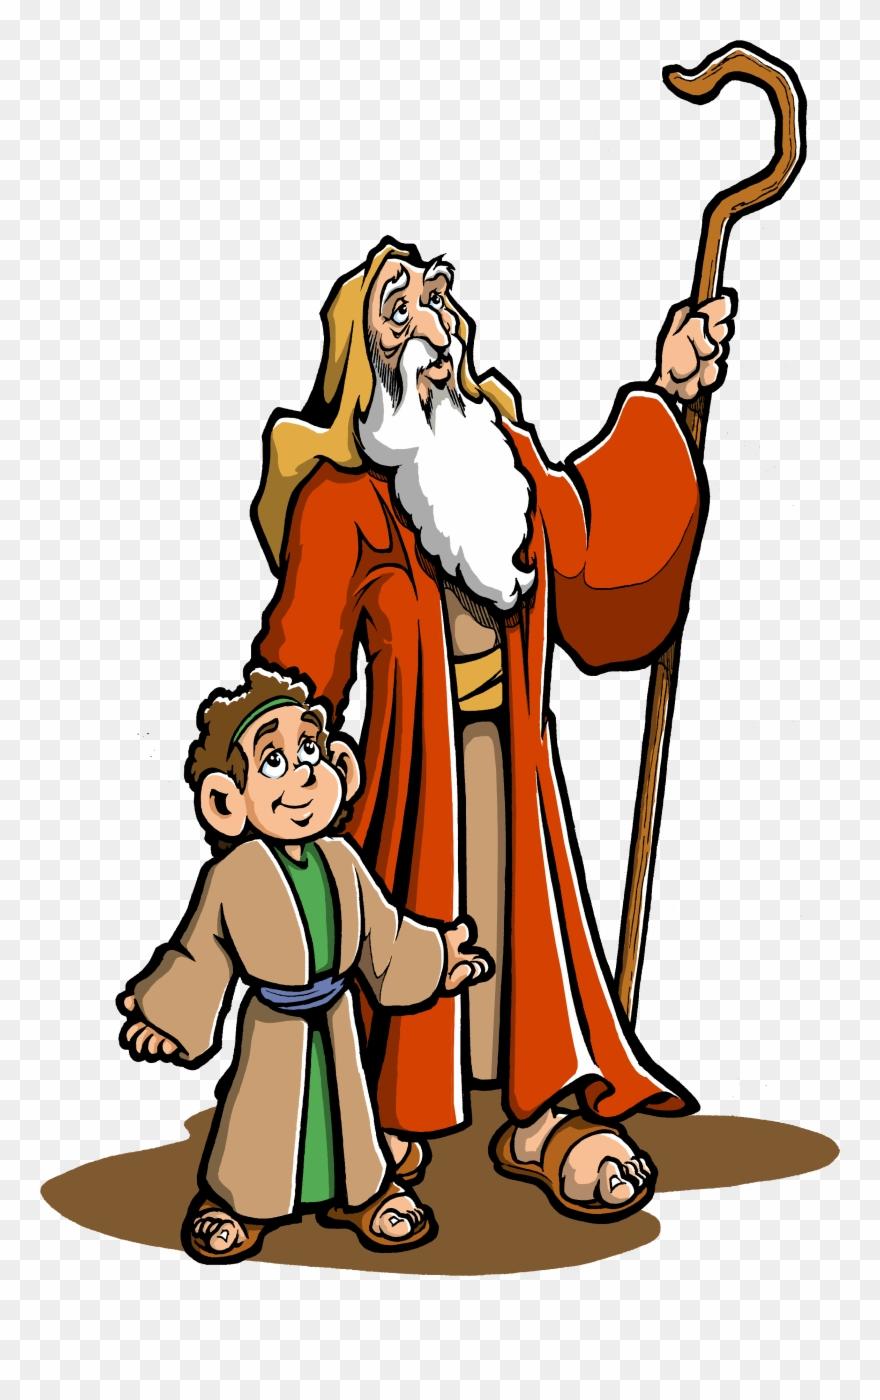 Abraham And Isaac Clipart - Isaac - Png Download (#1254644) - PinClipart svg free